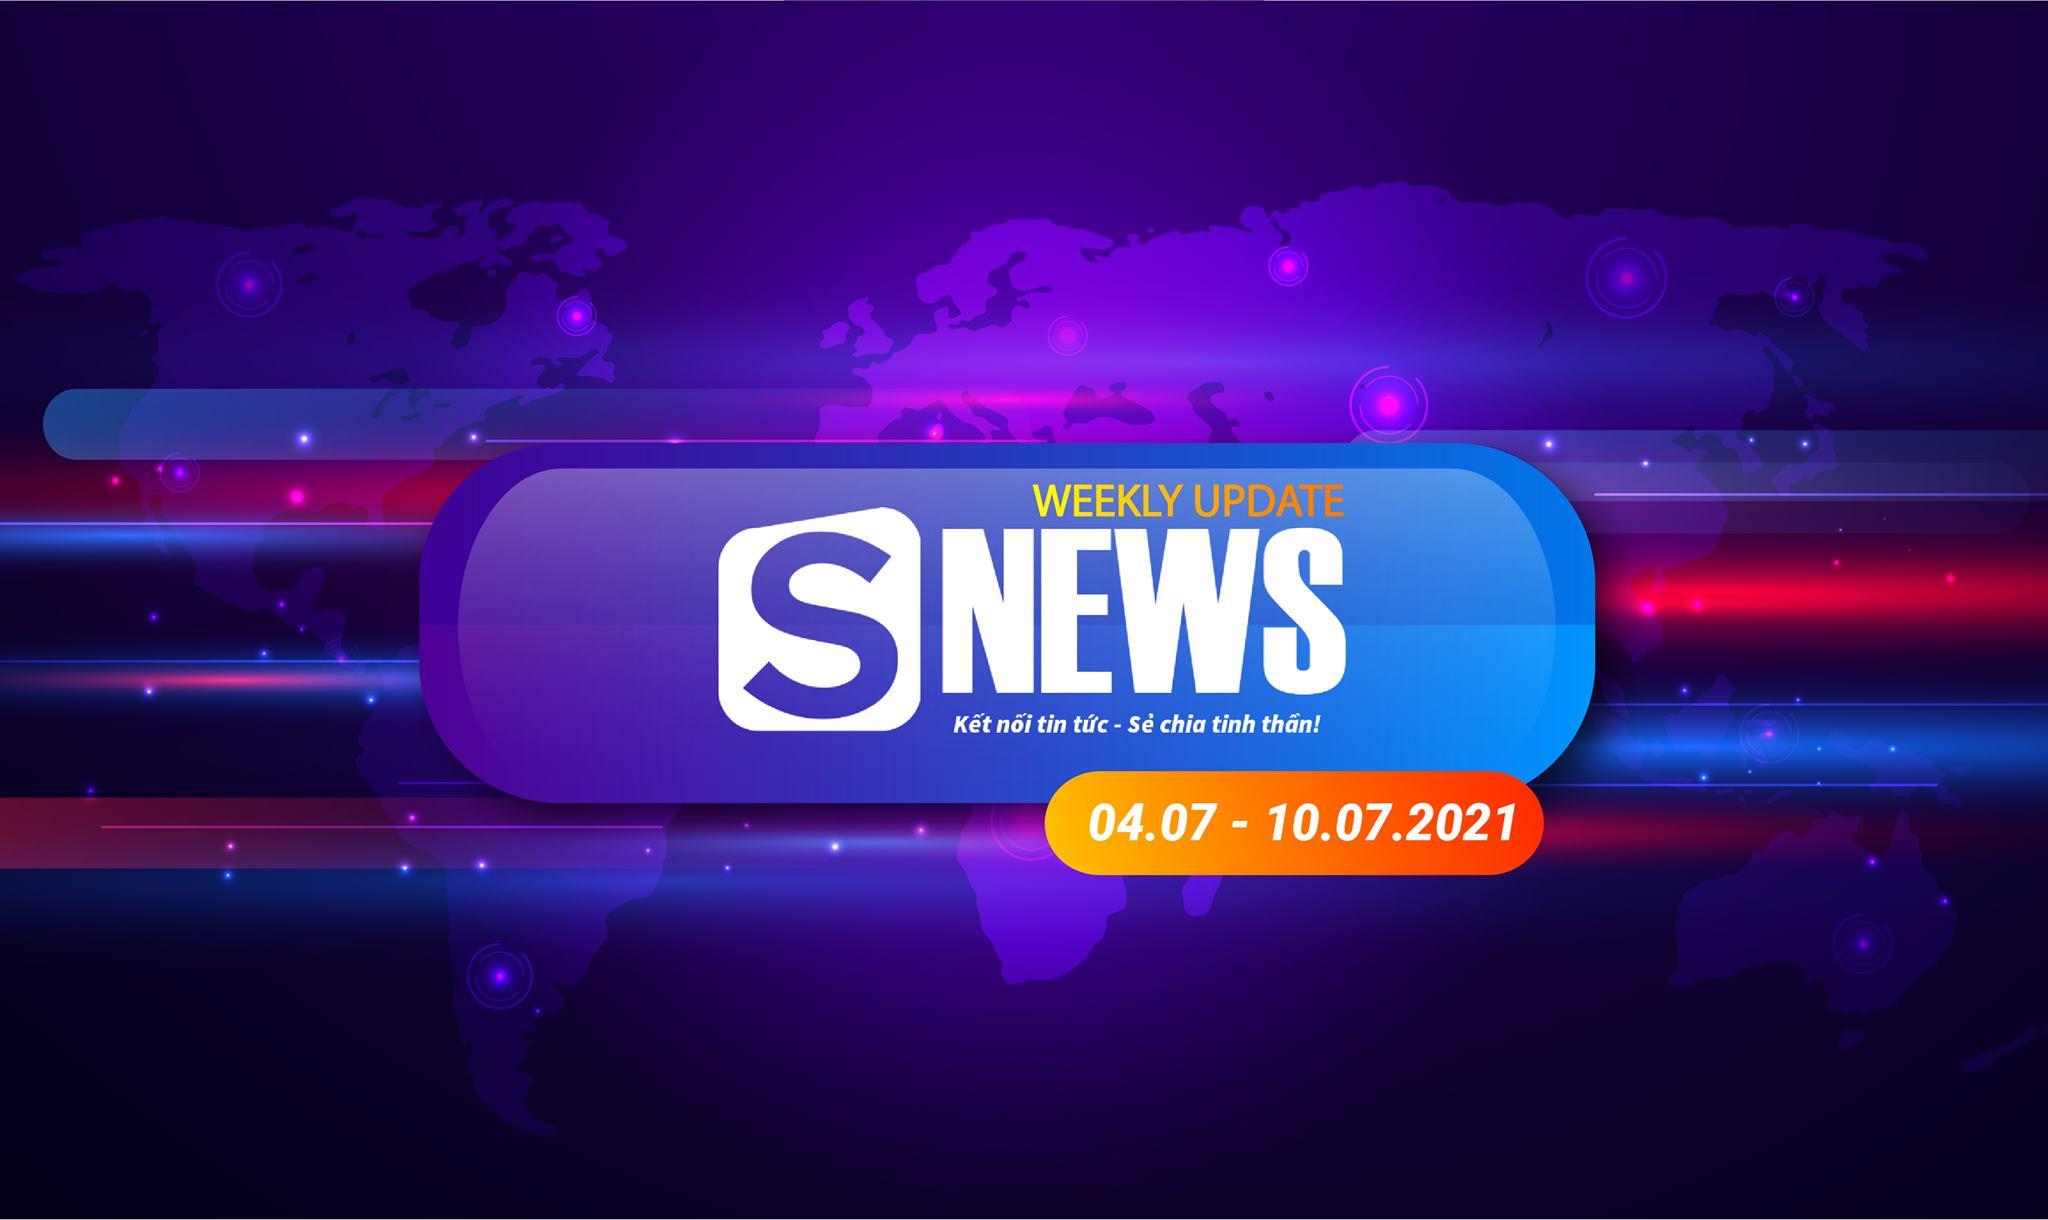 Tổng hợp tin tức Sapo tuần qua: 04.07 - 10.07.2021